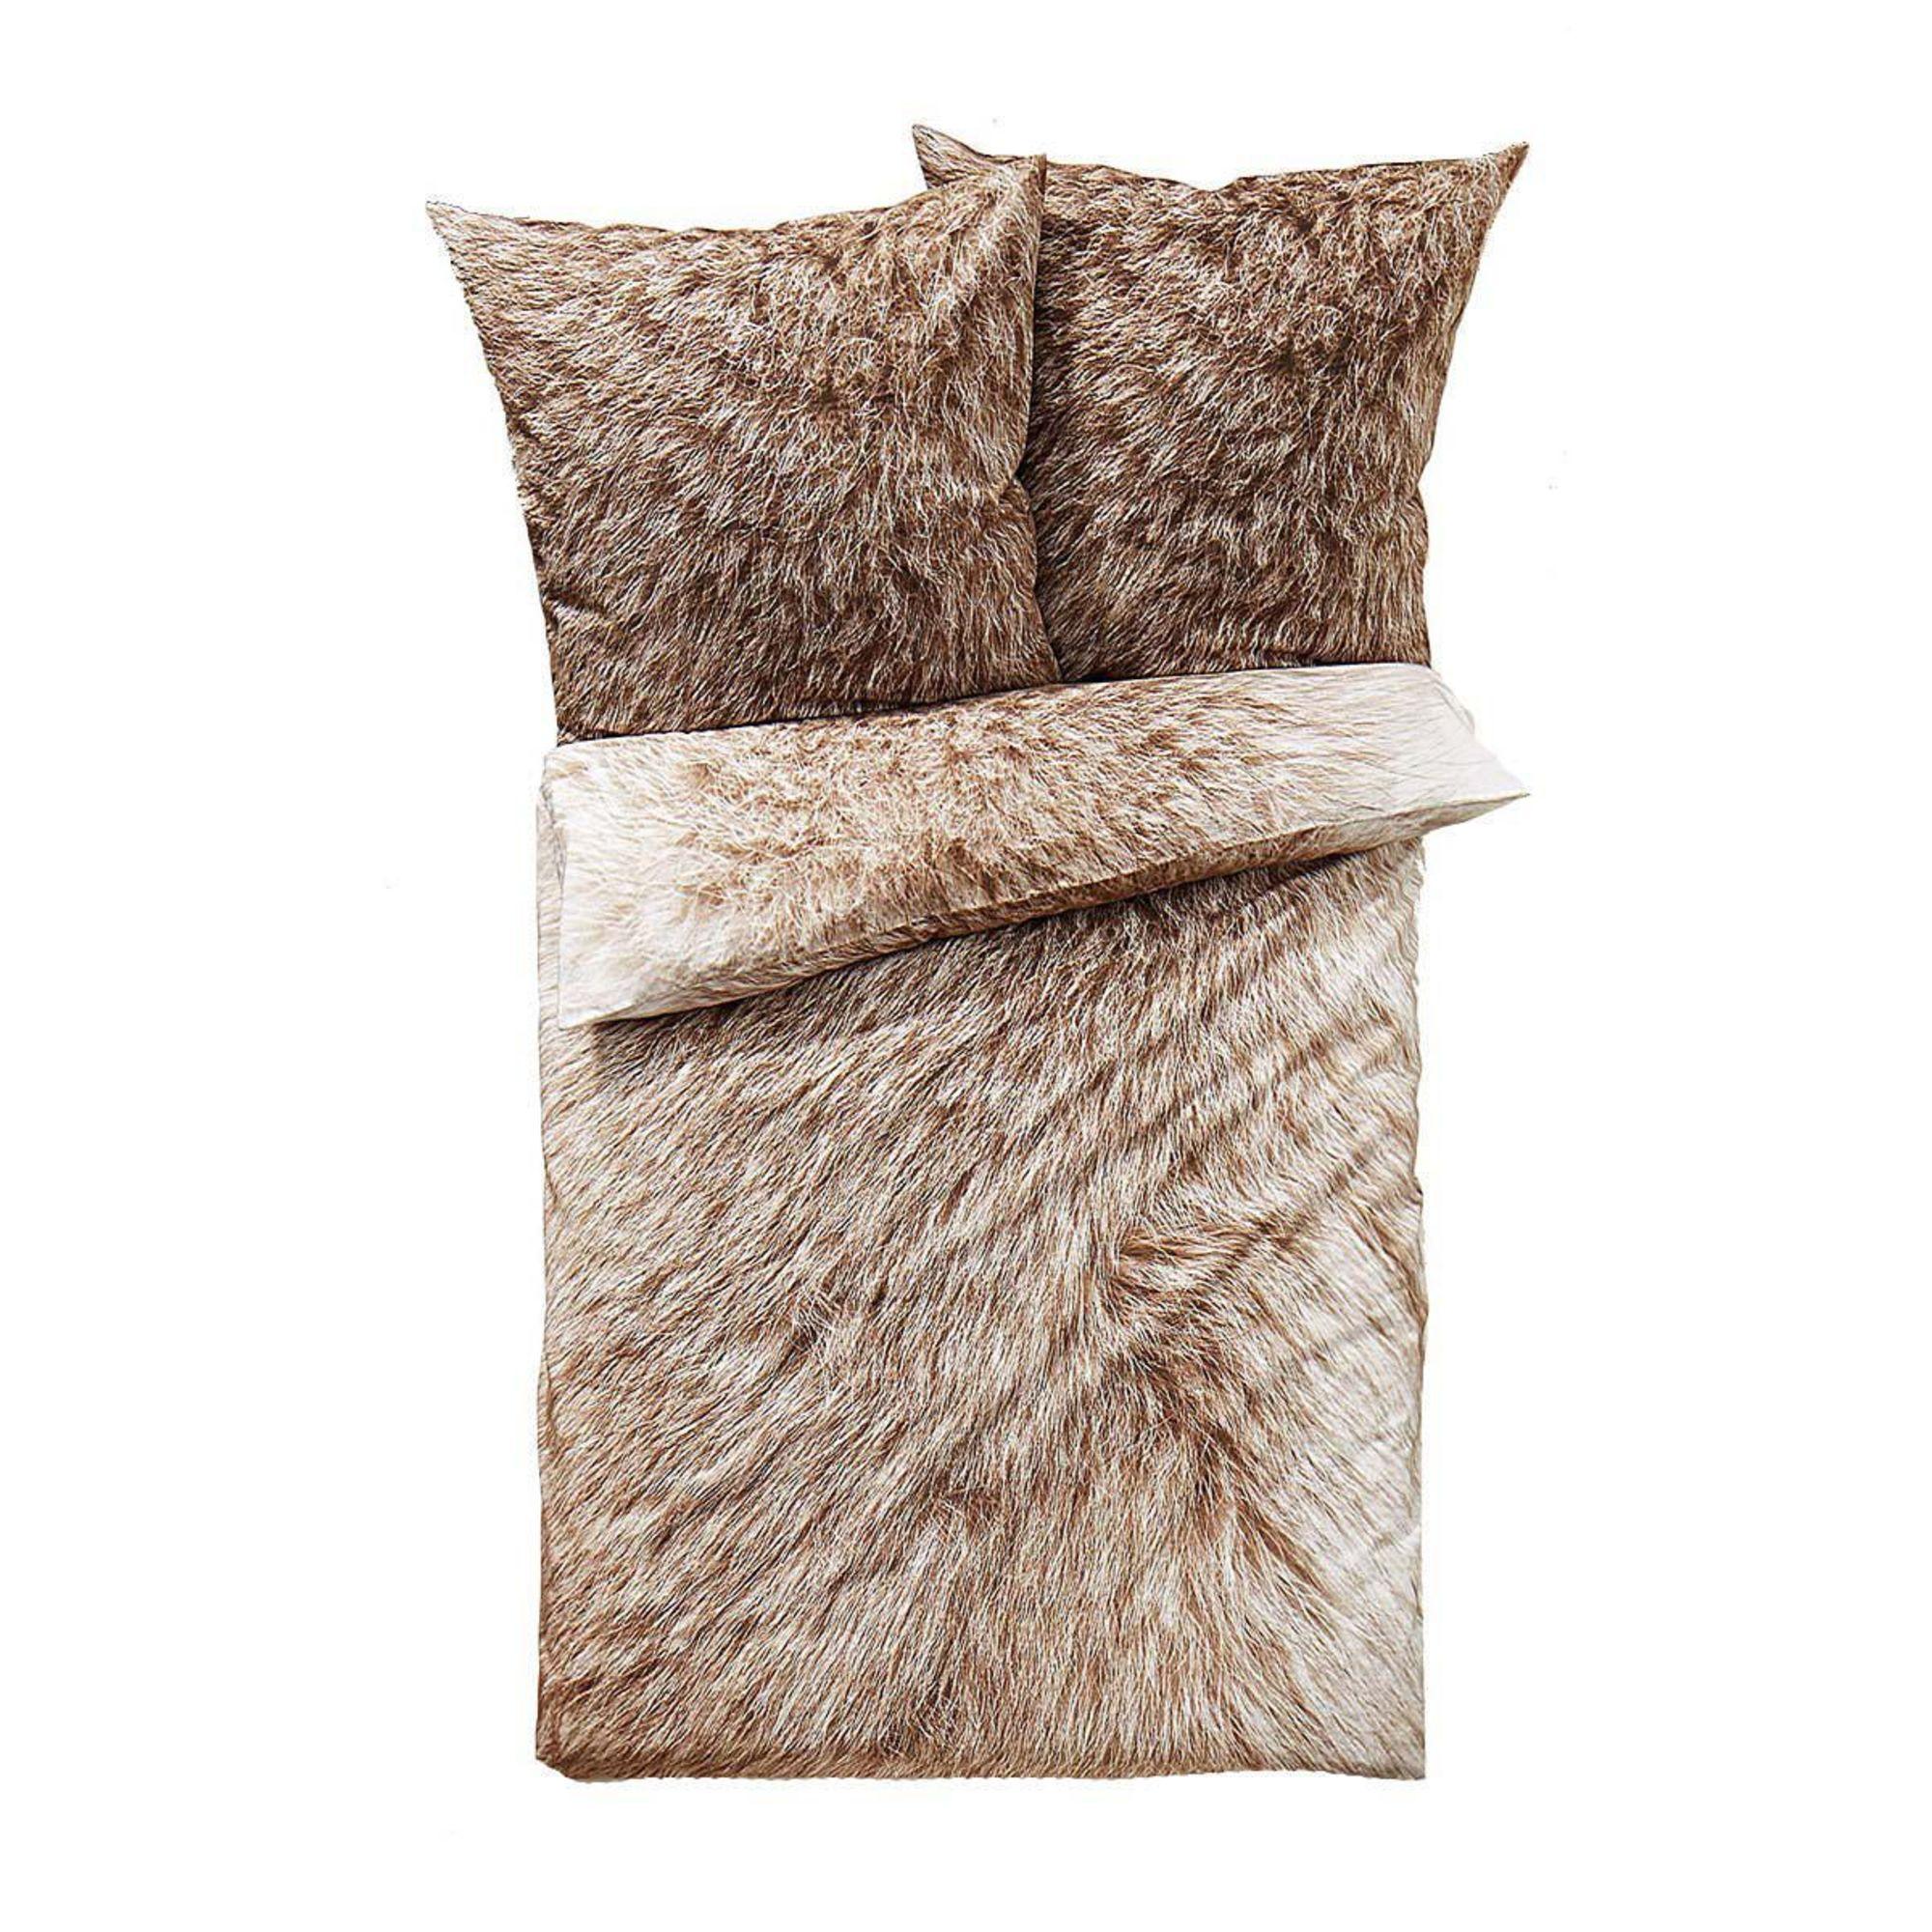 bettw sche mit rei verschluss baumwolle m belideen. Black Bedroom Furniture Sets. Home Design Ideas